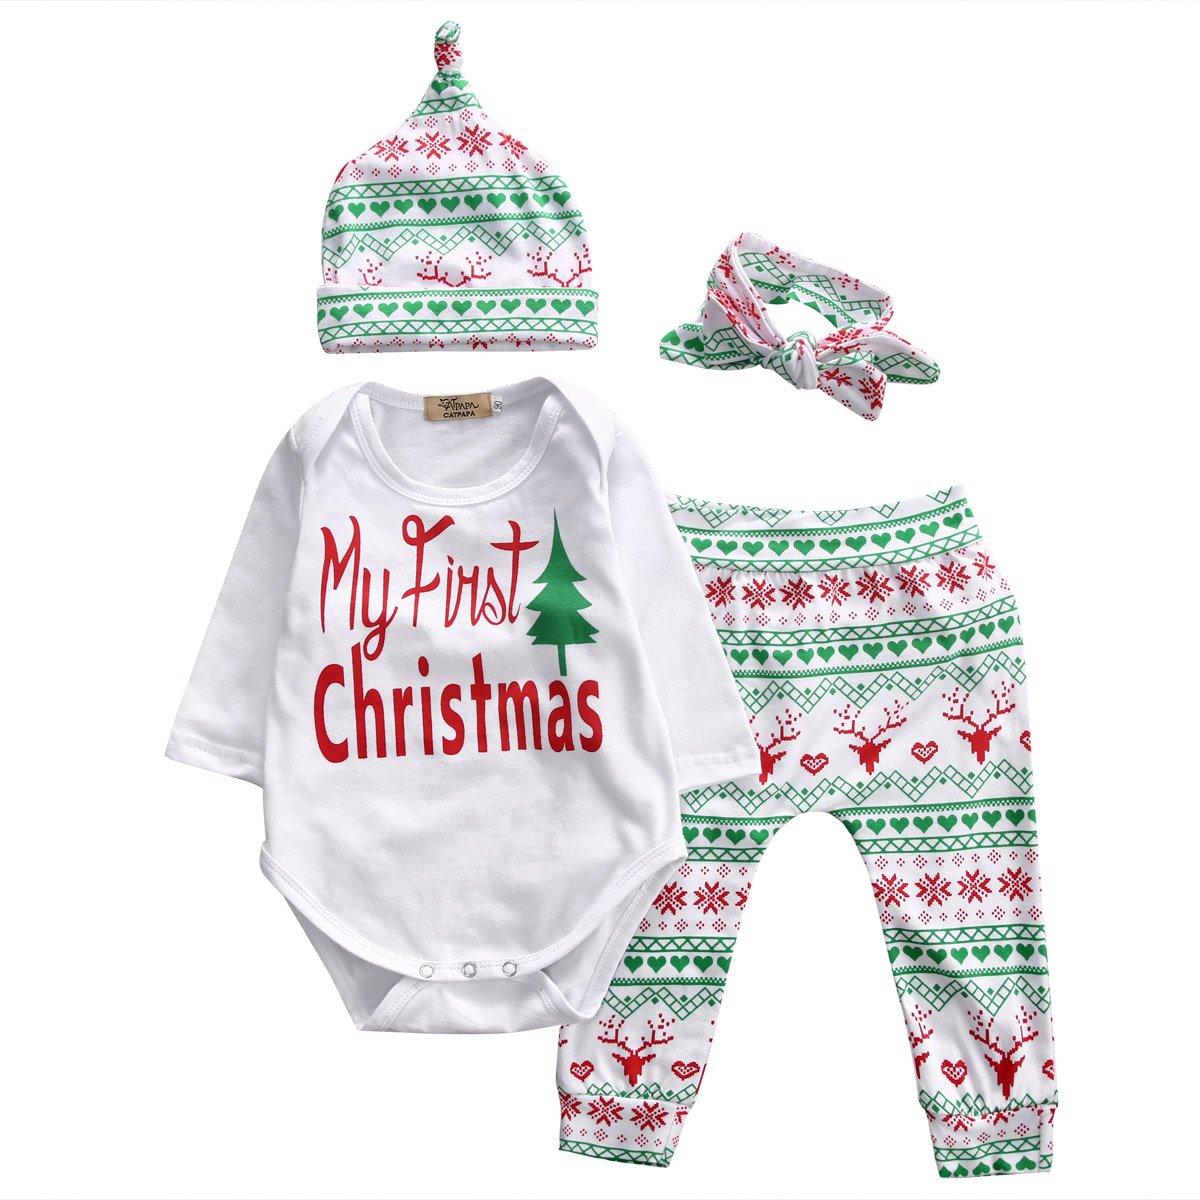 Juicart Baby Girls Christmas Xmas 4pcs Outfit Headband+Hat+Romper+Pants Leggings